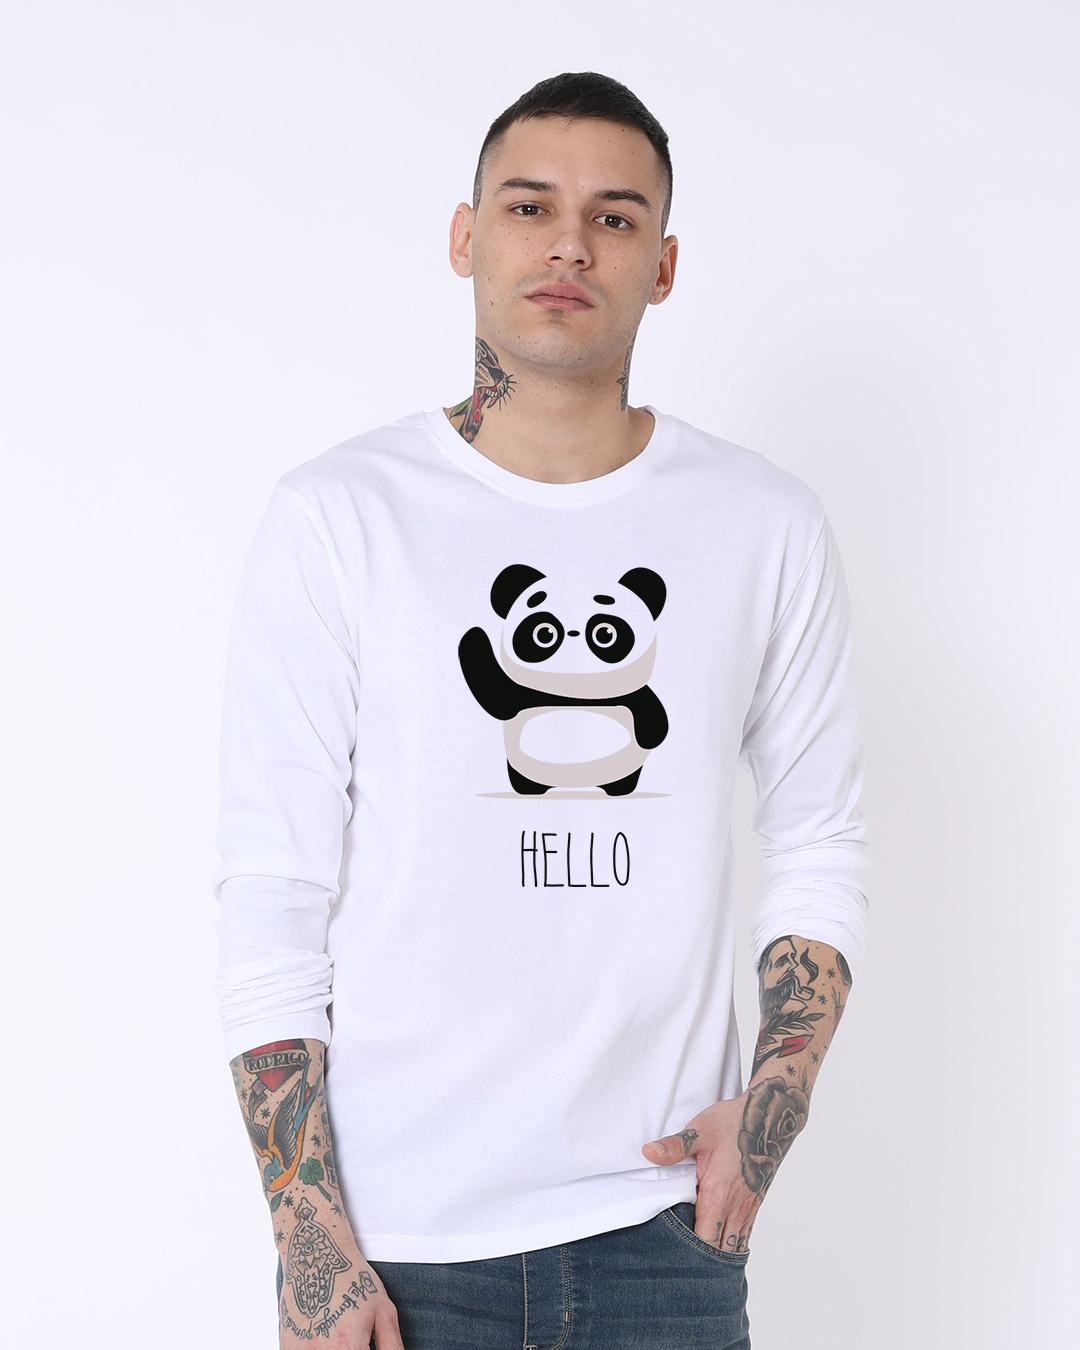 Buy hello panda printed full sleeve t shirt for men online for Jockey full sleeve t shirts india